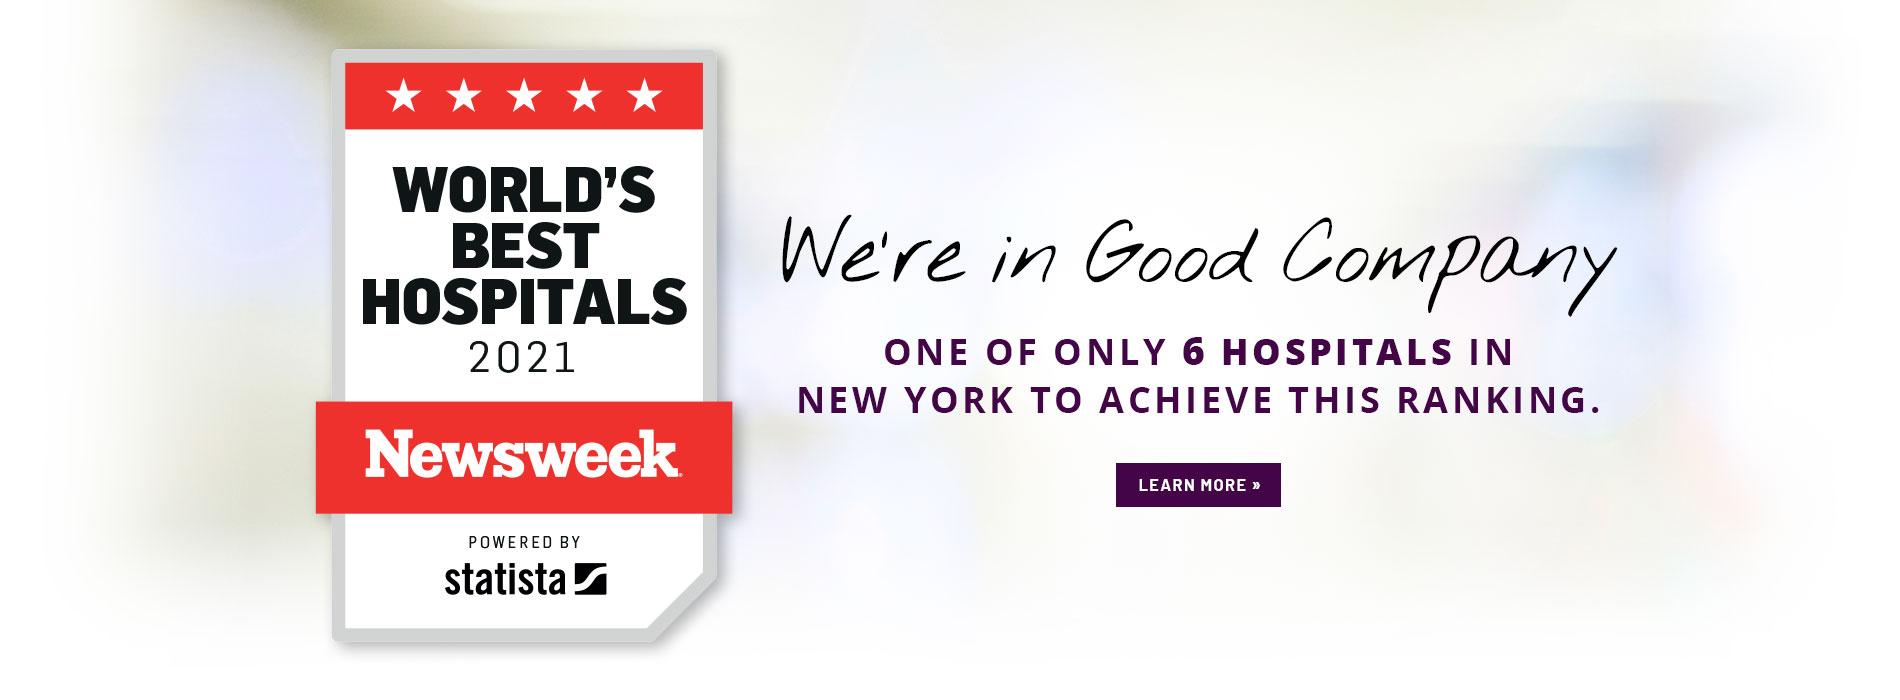 worlds best hospital list